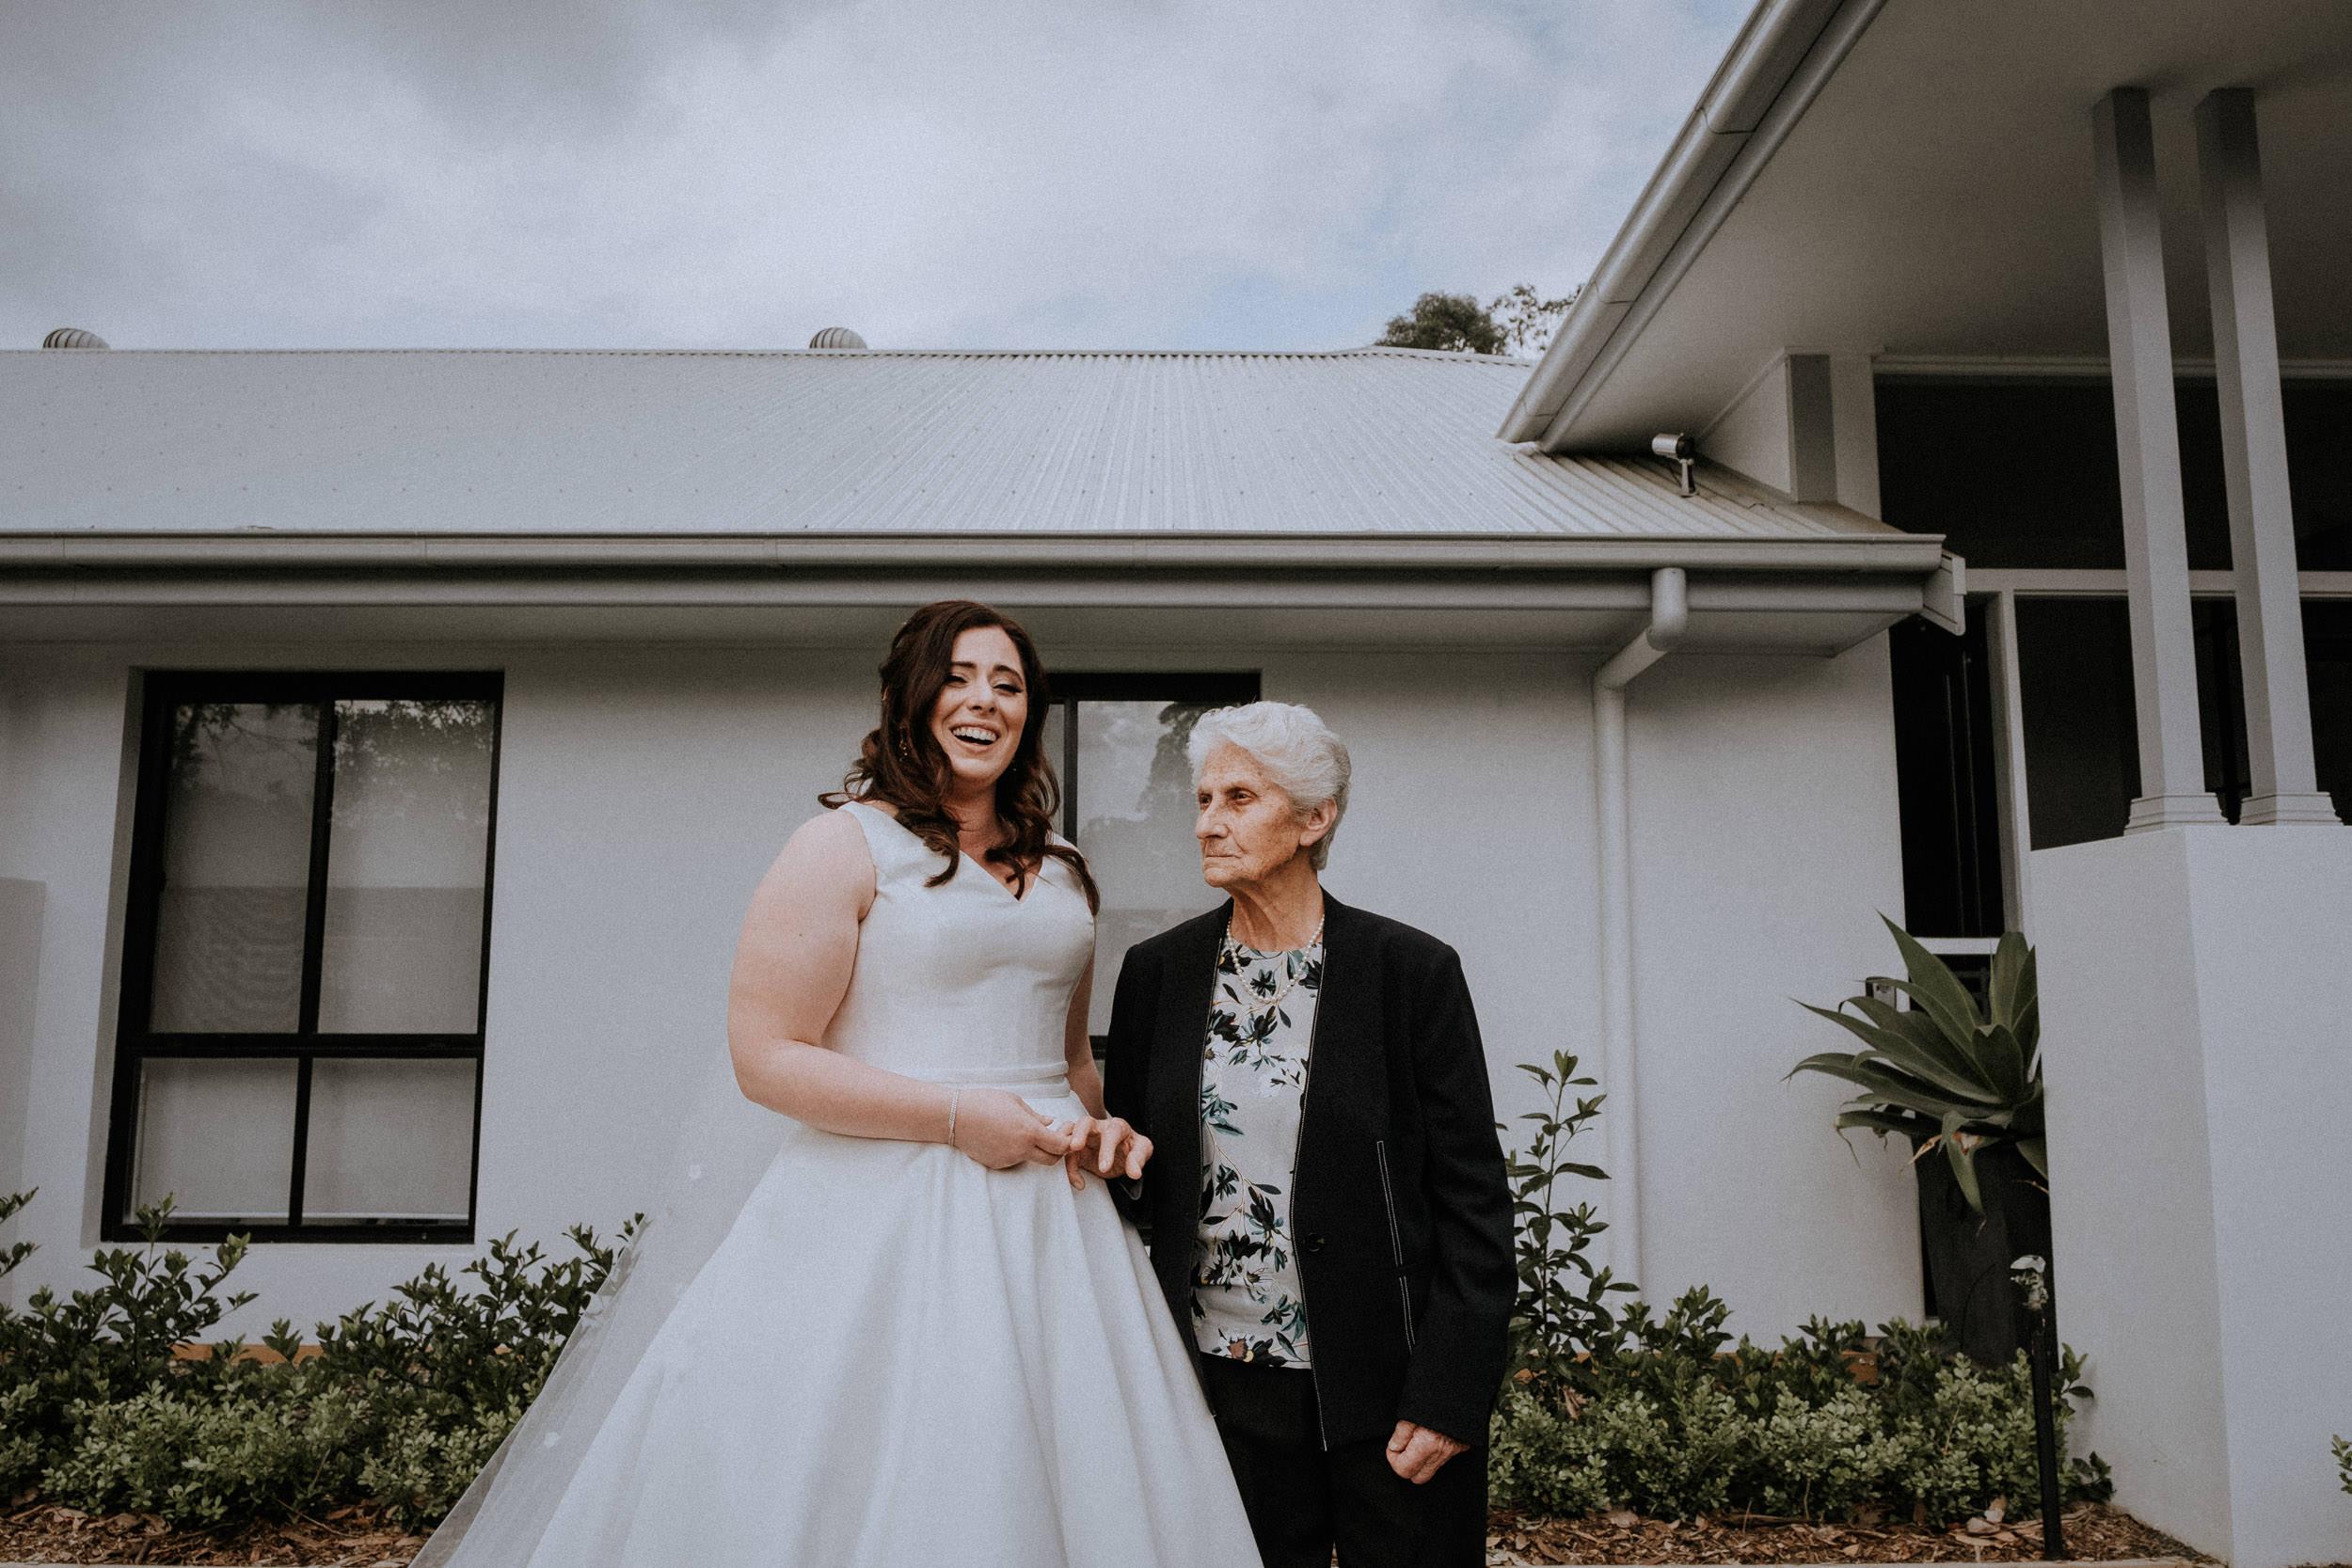 s+j_top_elopement wedding photography_kings & thieves_blog - 142.jpg